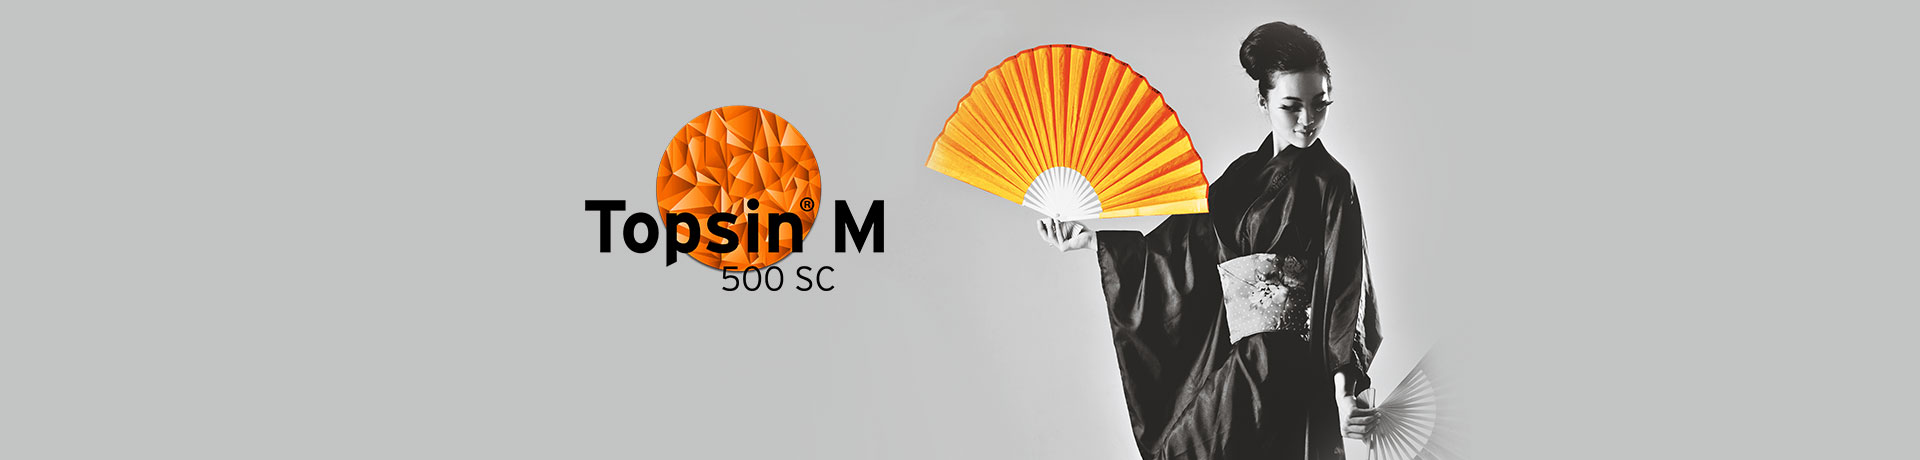 Topsin M 500 SC